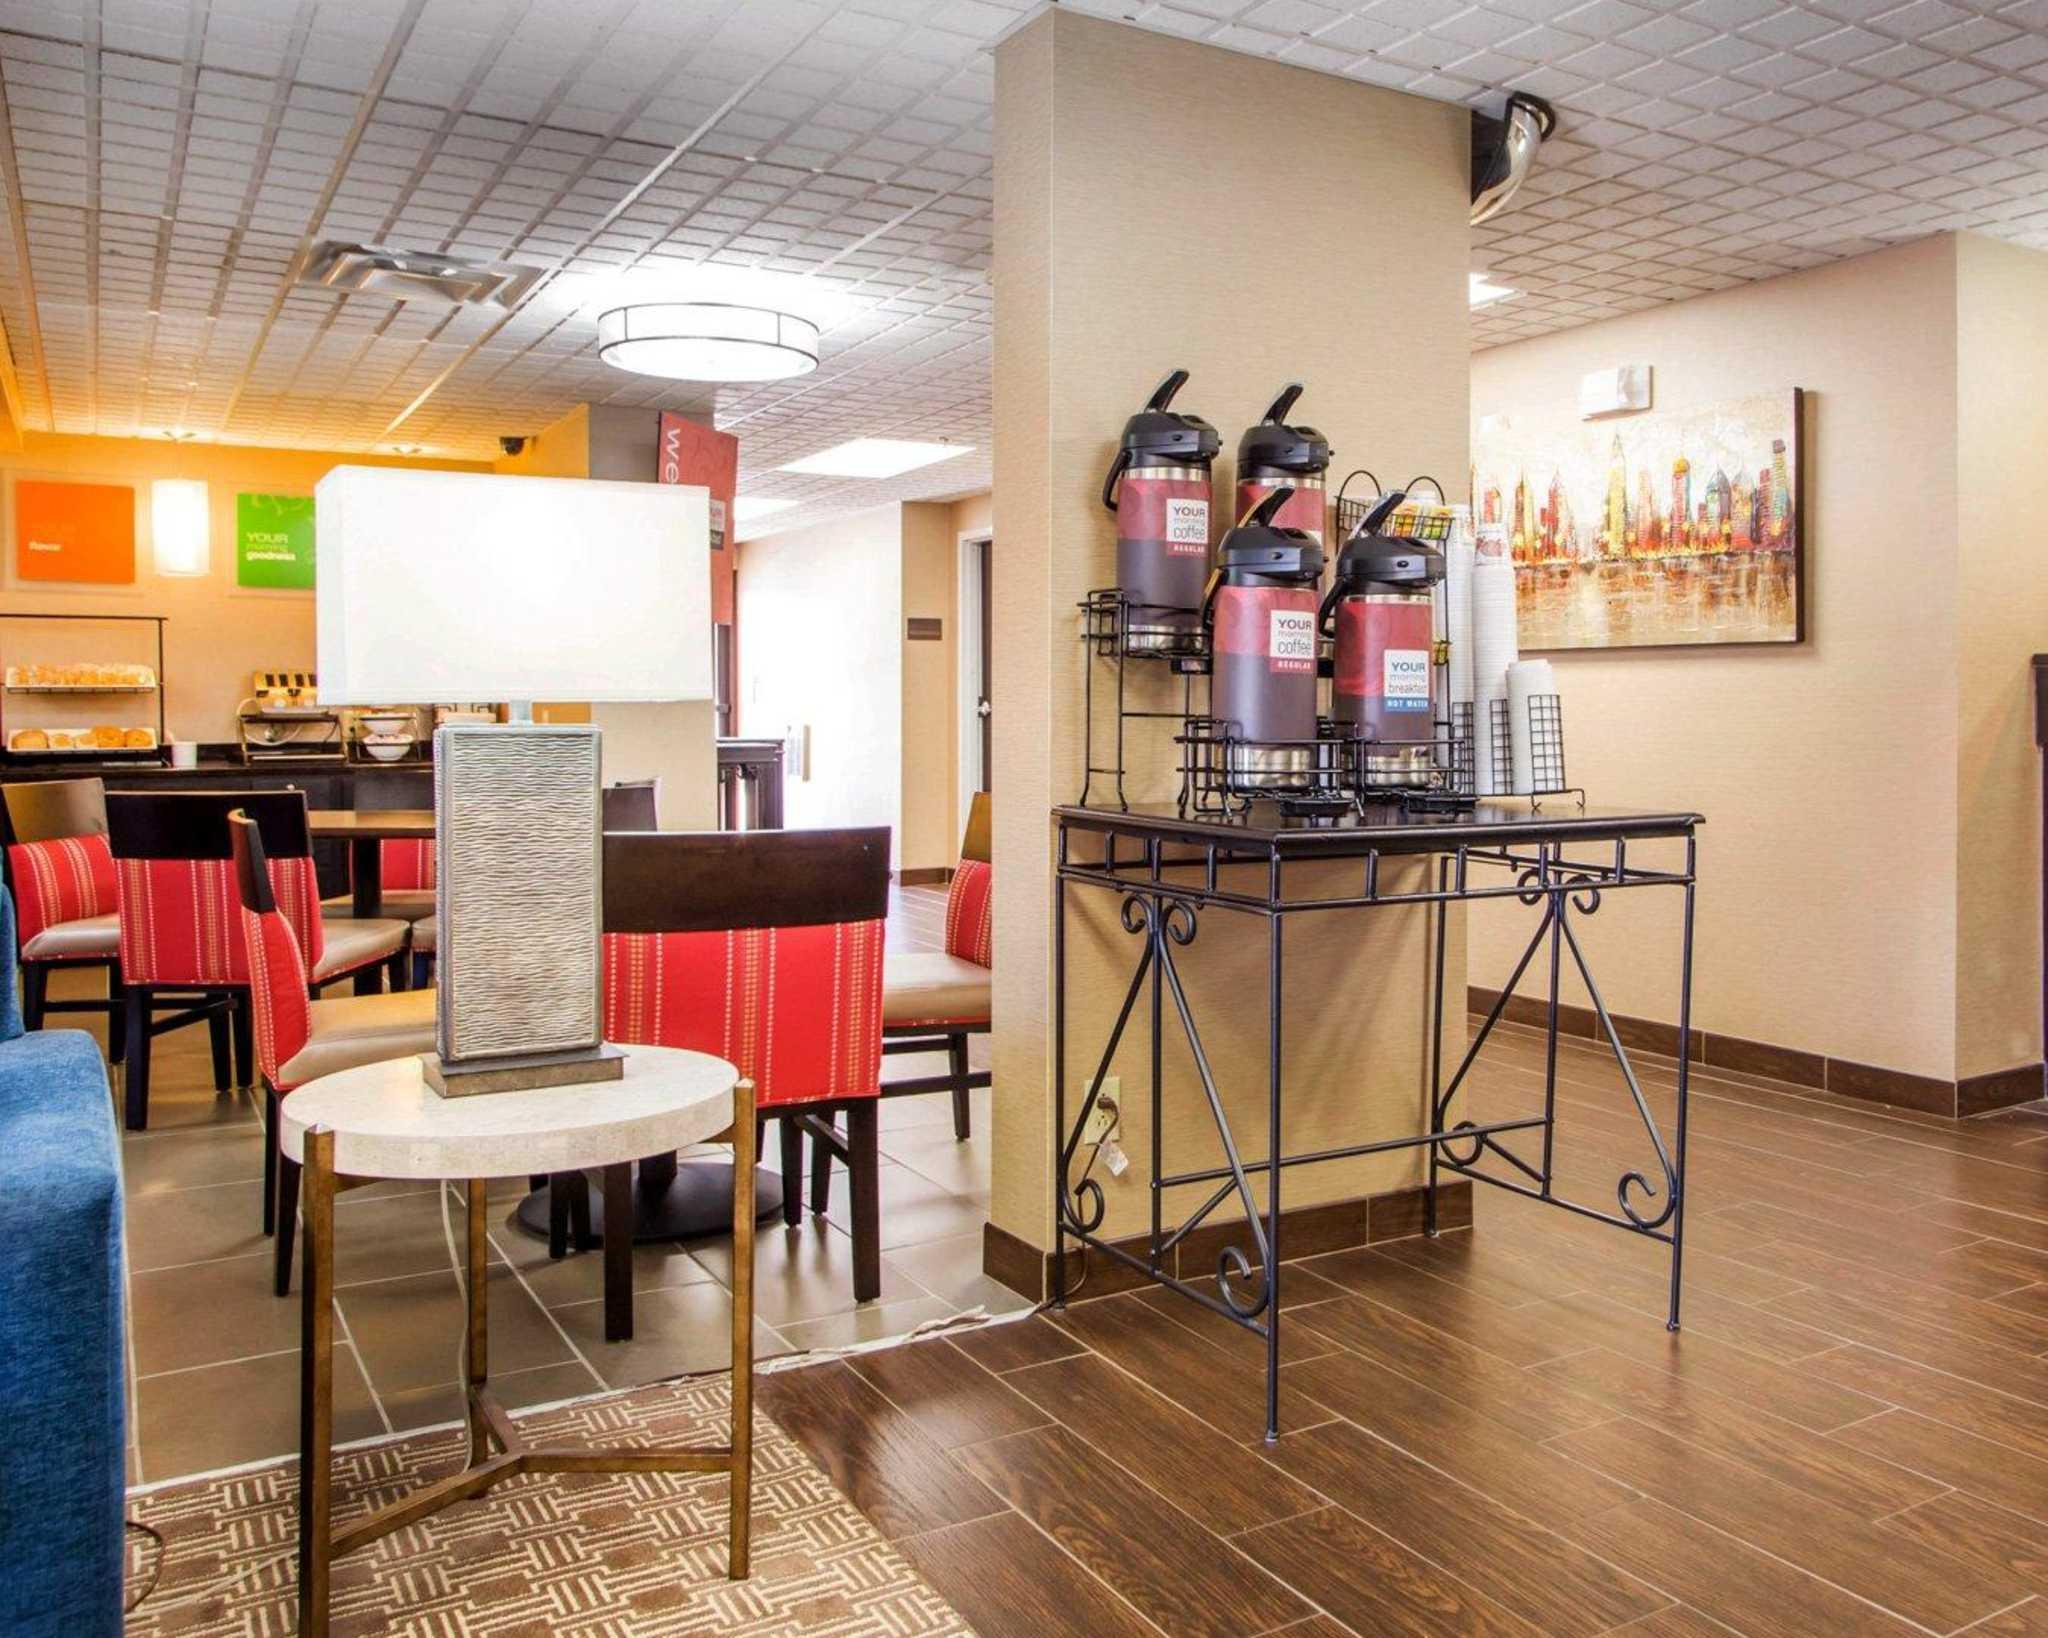 Comfort Inn Dayton - Huber Heights image 20